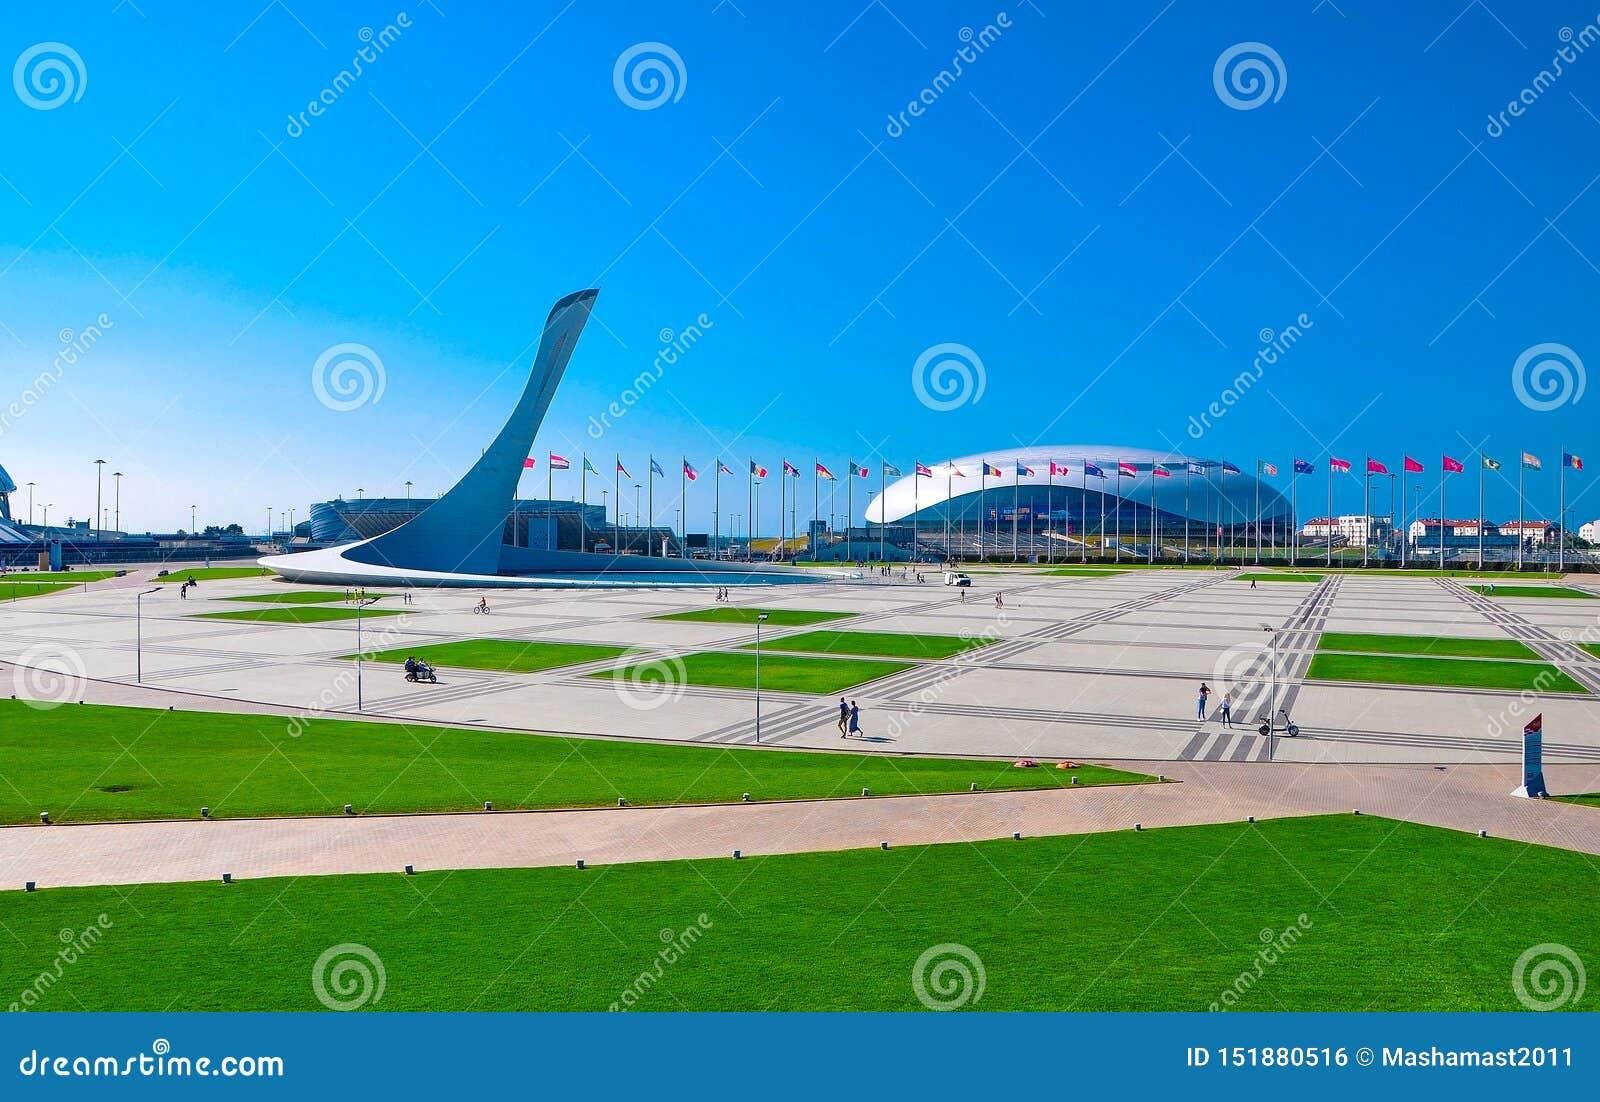 Russland, Sochi - 14. Oktober 2018 - Stadions-Arena groß im Imereti-Erholungsort